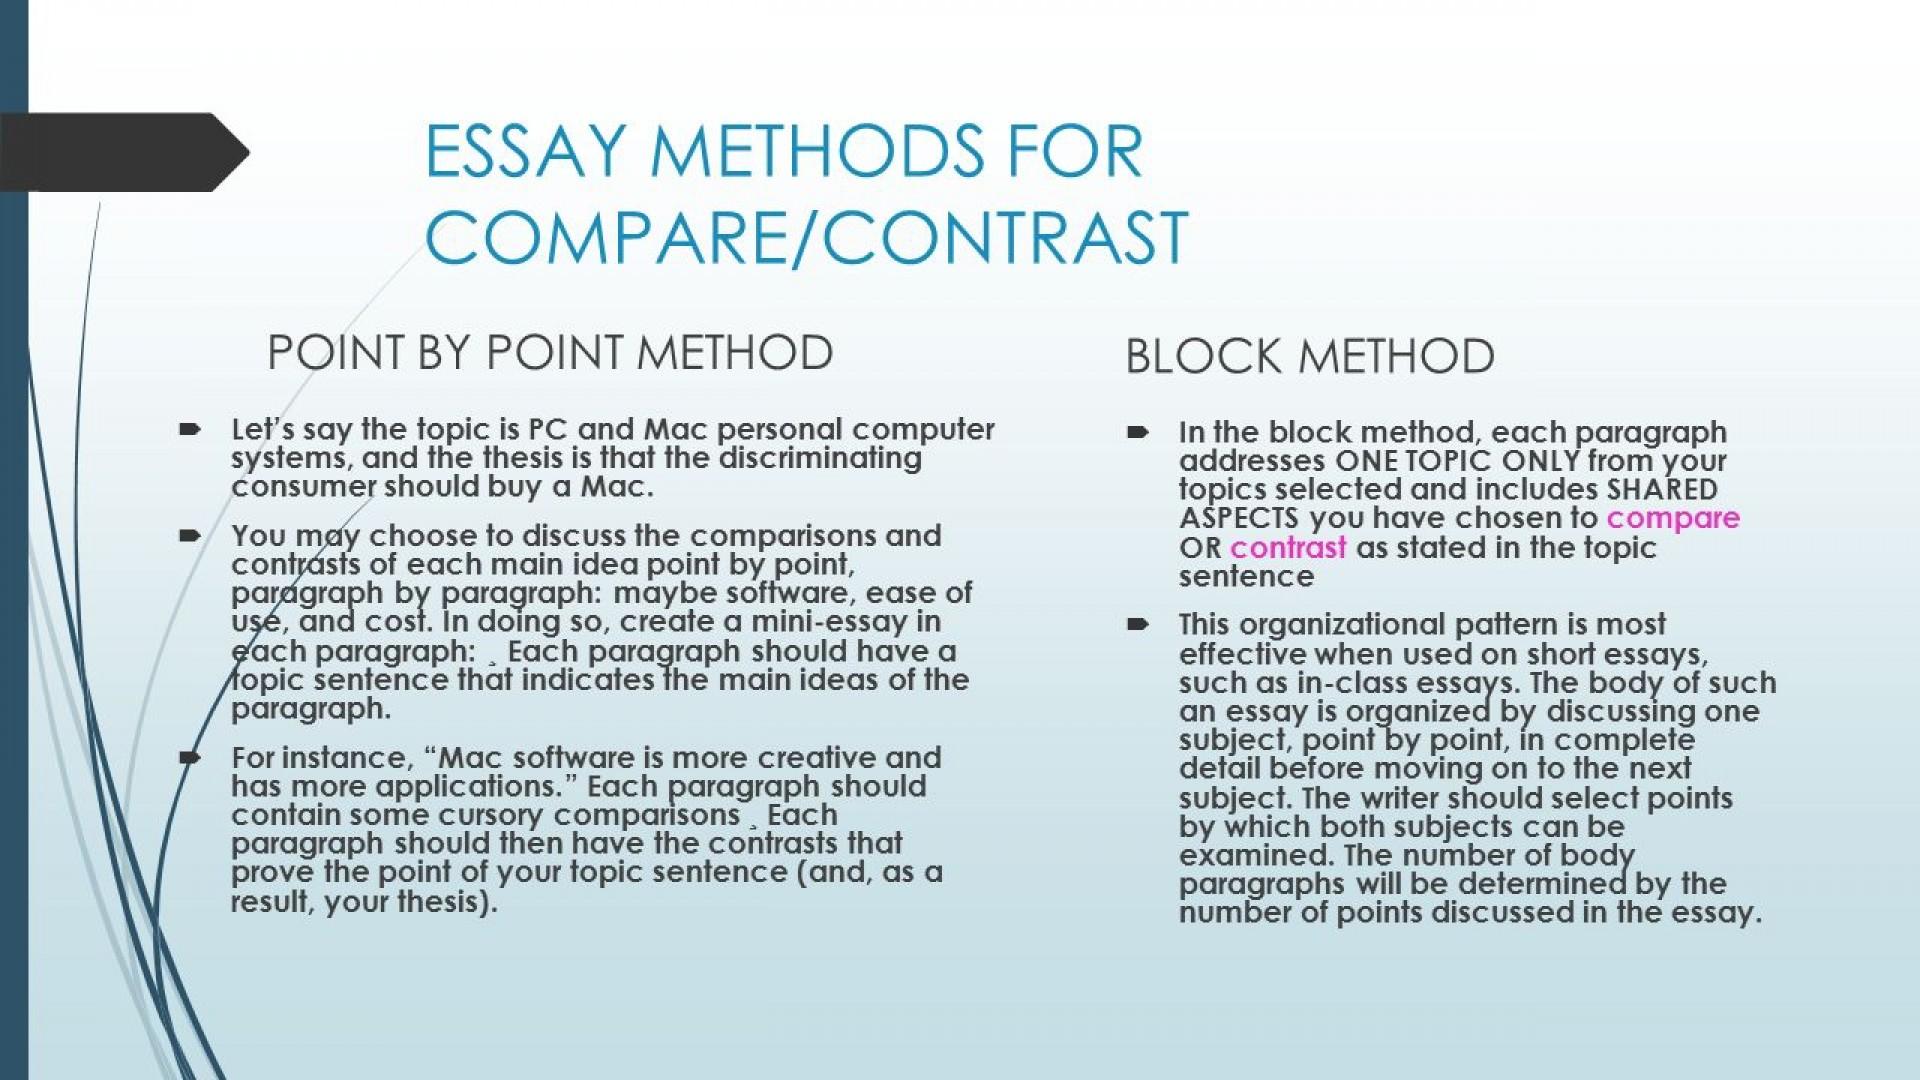 001 Essay Example Compare And Contrasting Contrast Point By Writing Method In Kannada Sli Methods Models Methodology Sample Pdf Urdu Hindi Methodologie Ielts Wonderful Structure Outline Introduction 1920